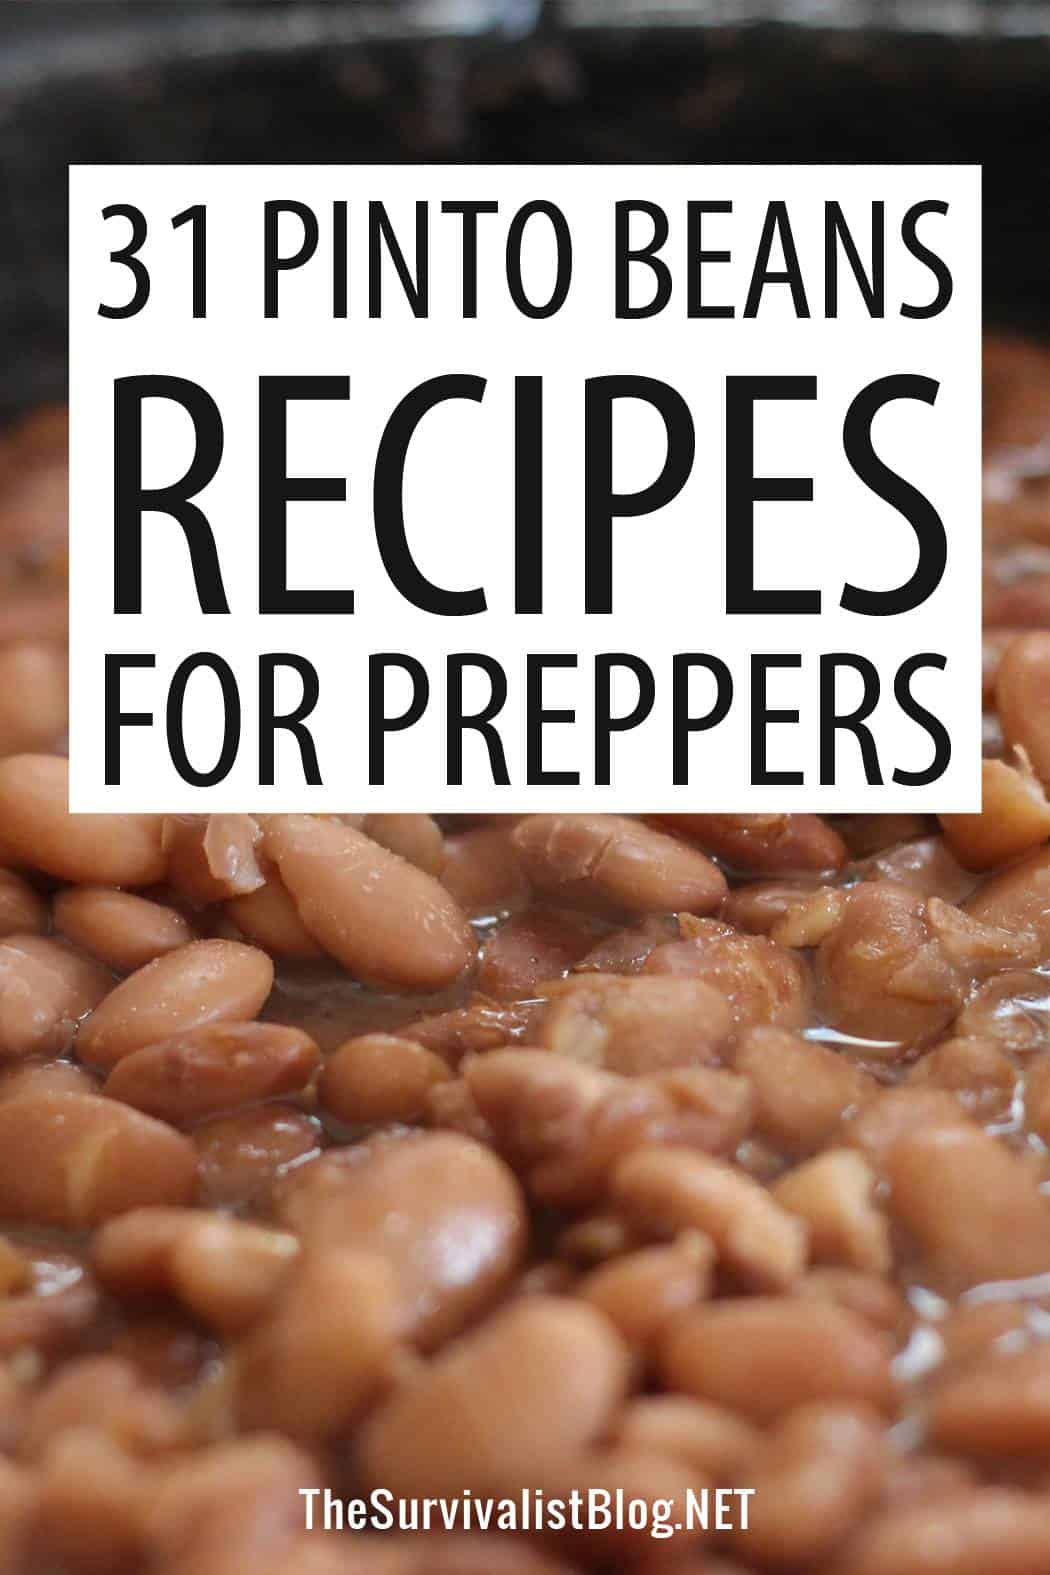 pinto beans recipes Pinterest image